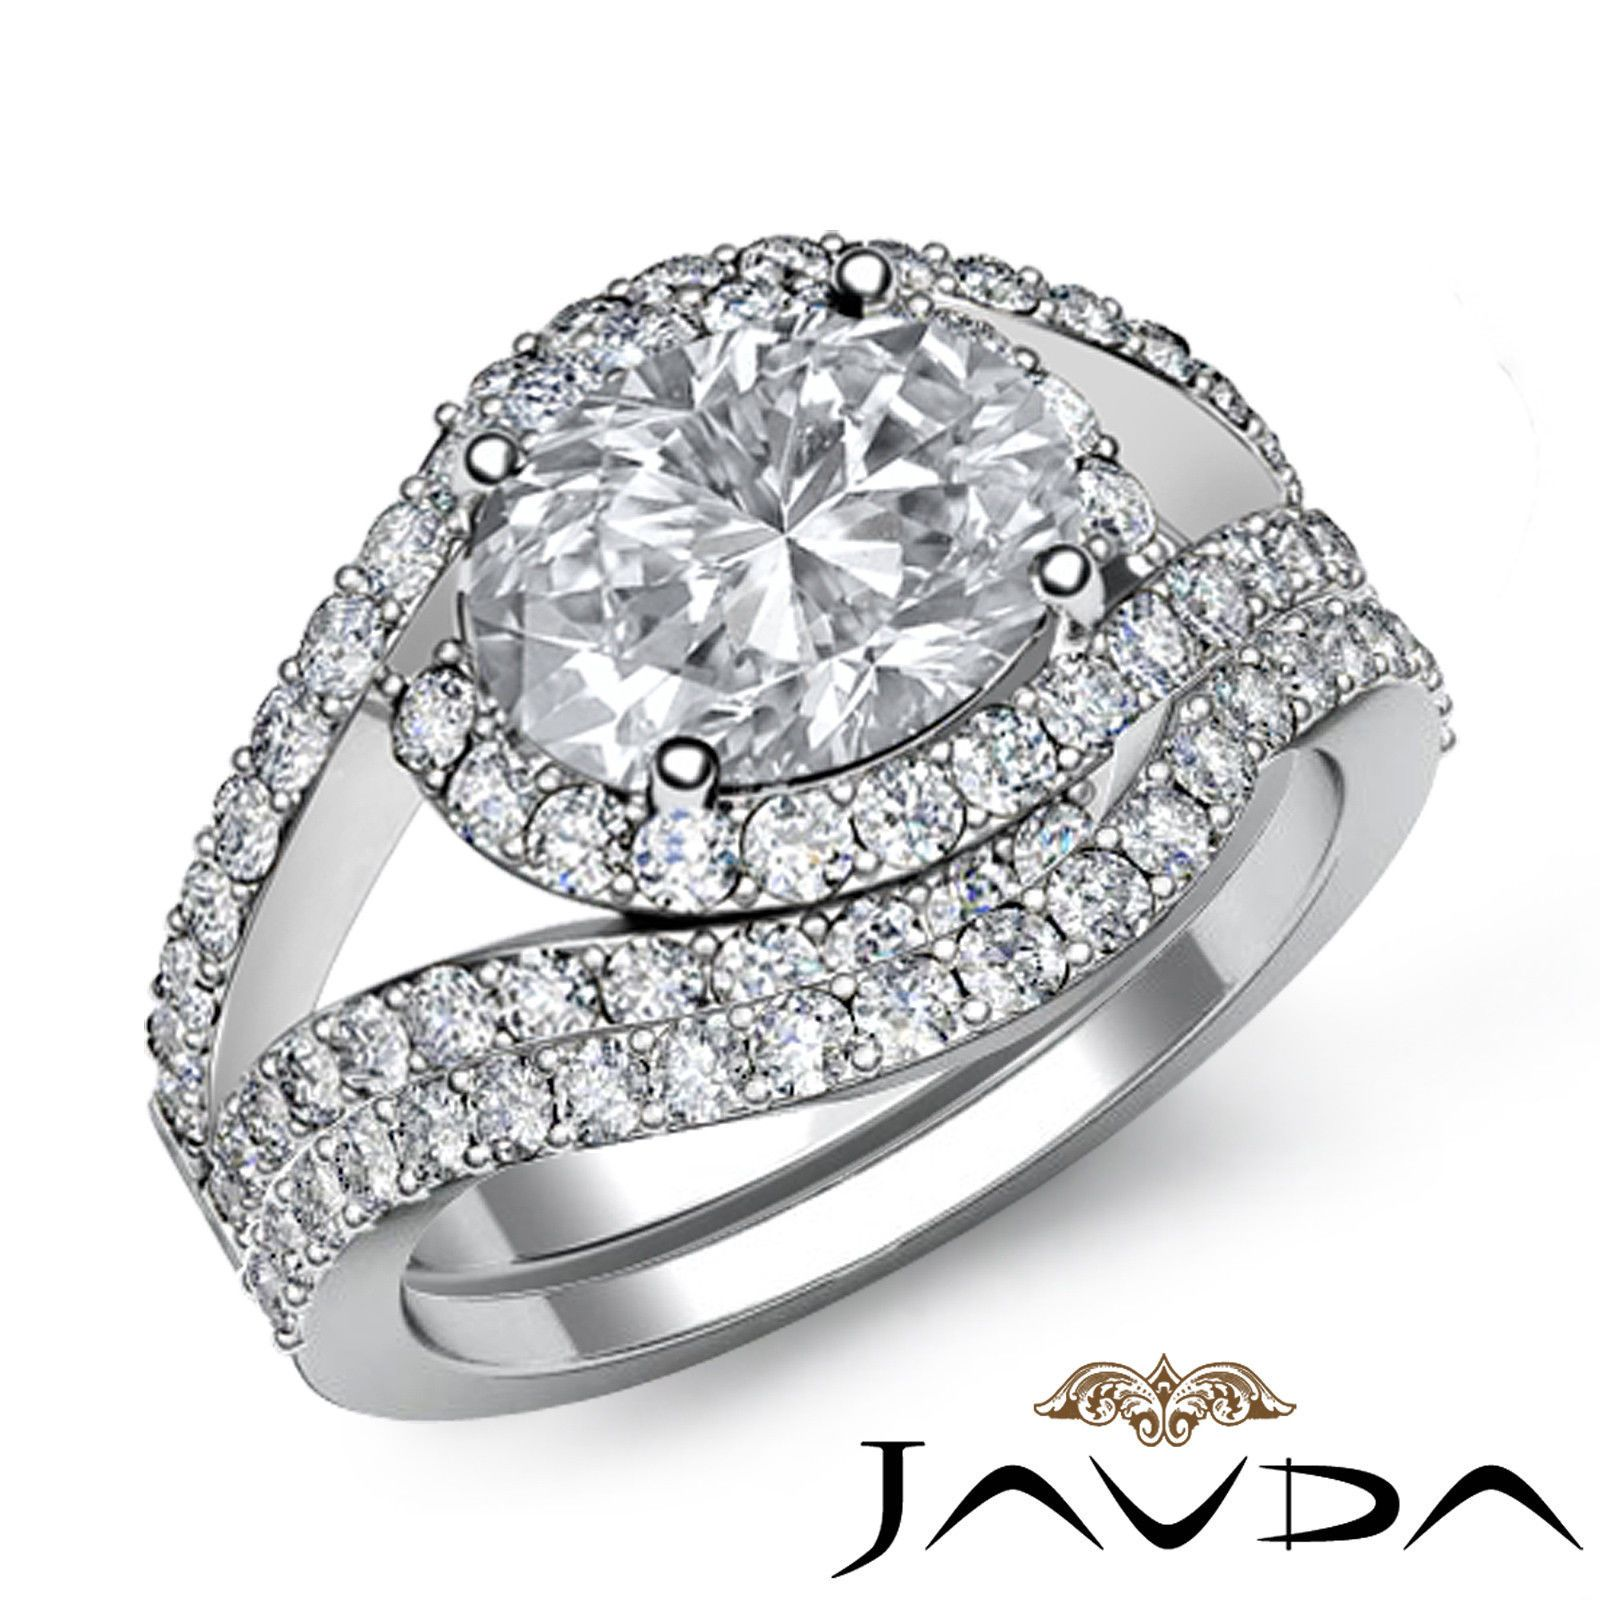 Halo Oval Bridal Set Diamond Engagement Pave Ring GIA I VS2